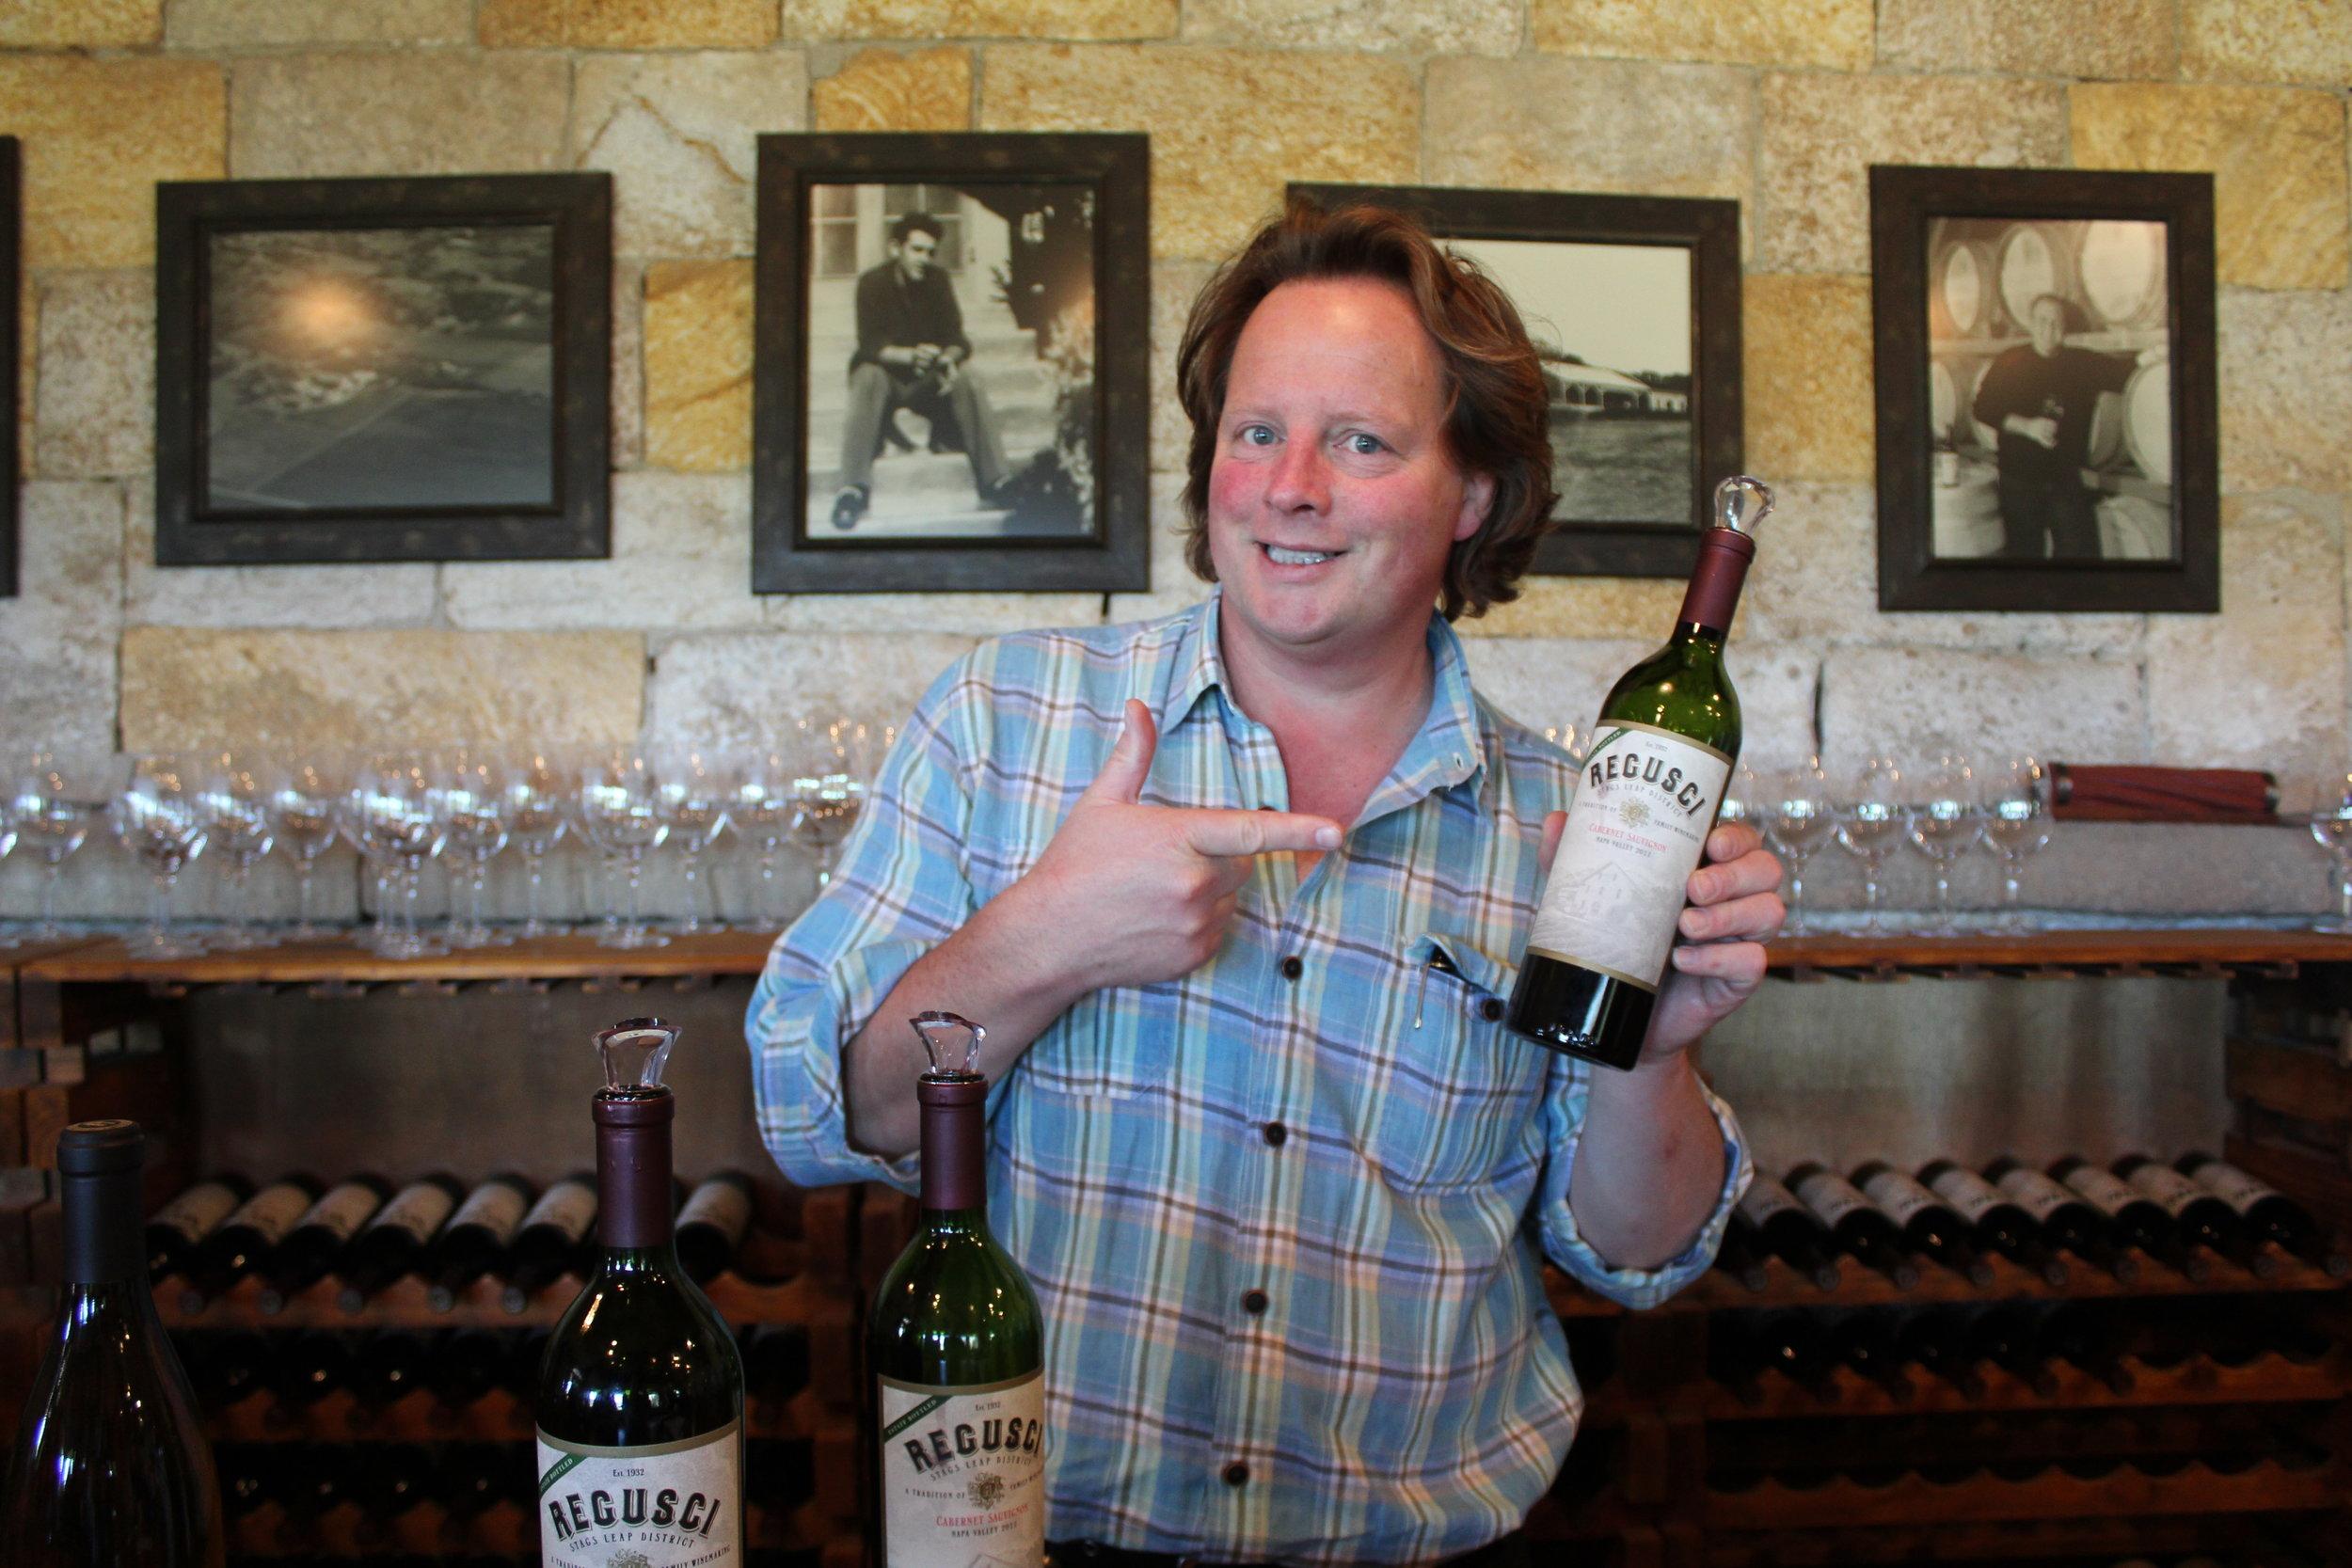 Regusci Winery in Napa